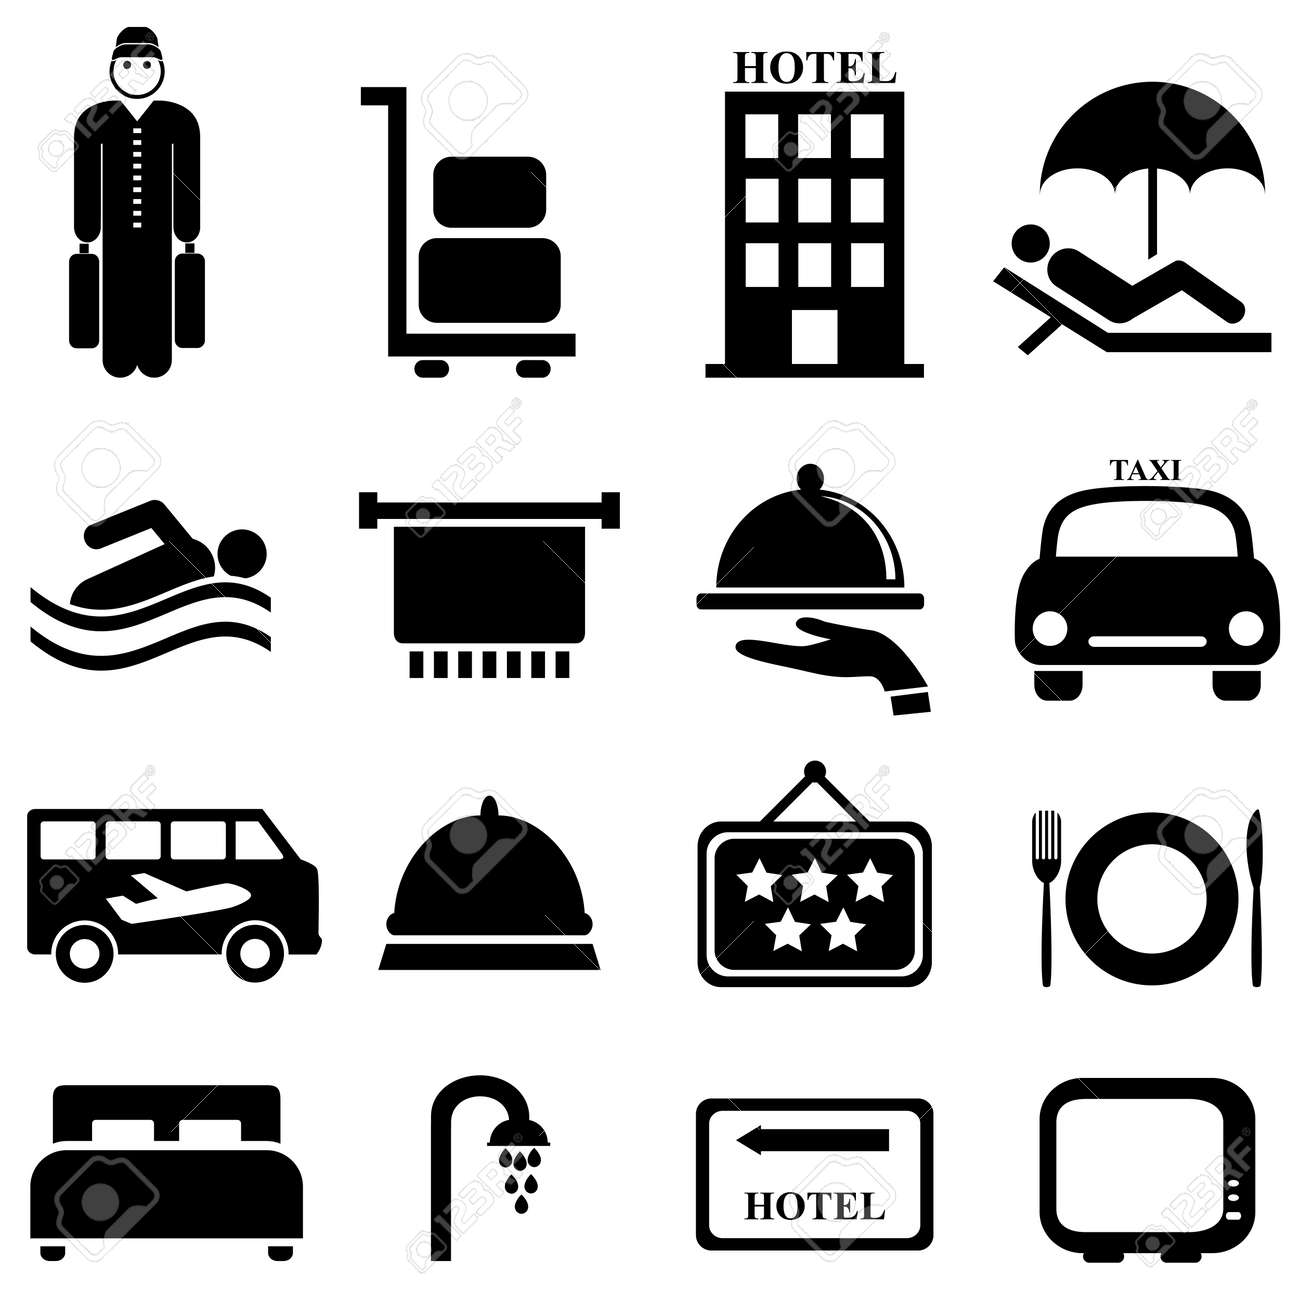 Hotel and hospitality icon set - 27563892